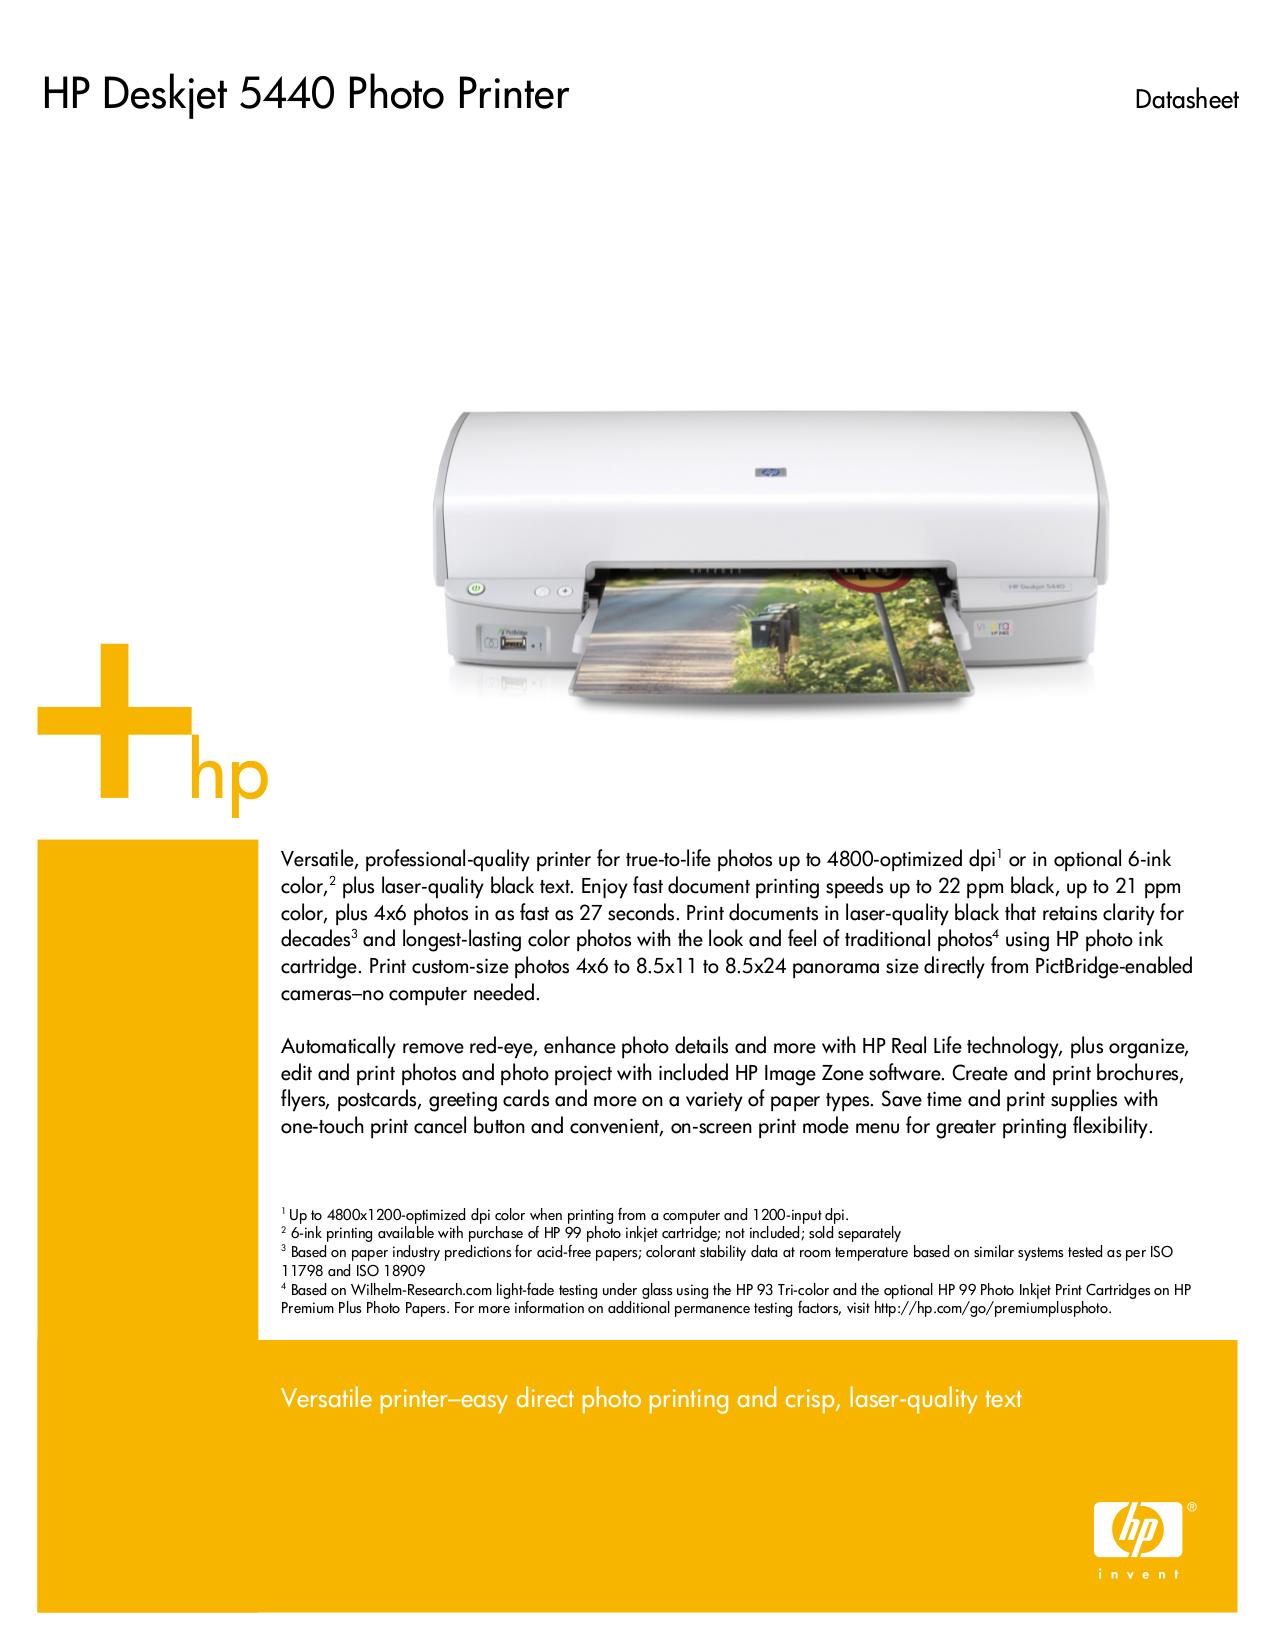 download free pdf for hp deskjet 5440 printer manual rh umlib com hp deskjet 6540 manual online hp deskjet 5440 service manual